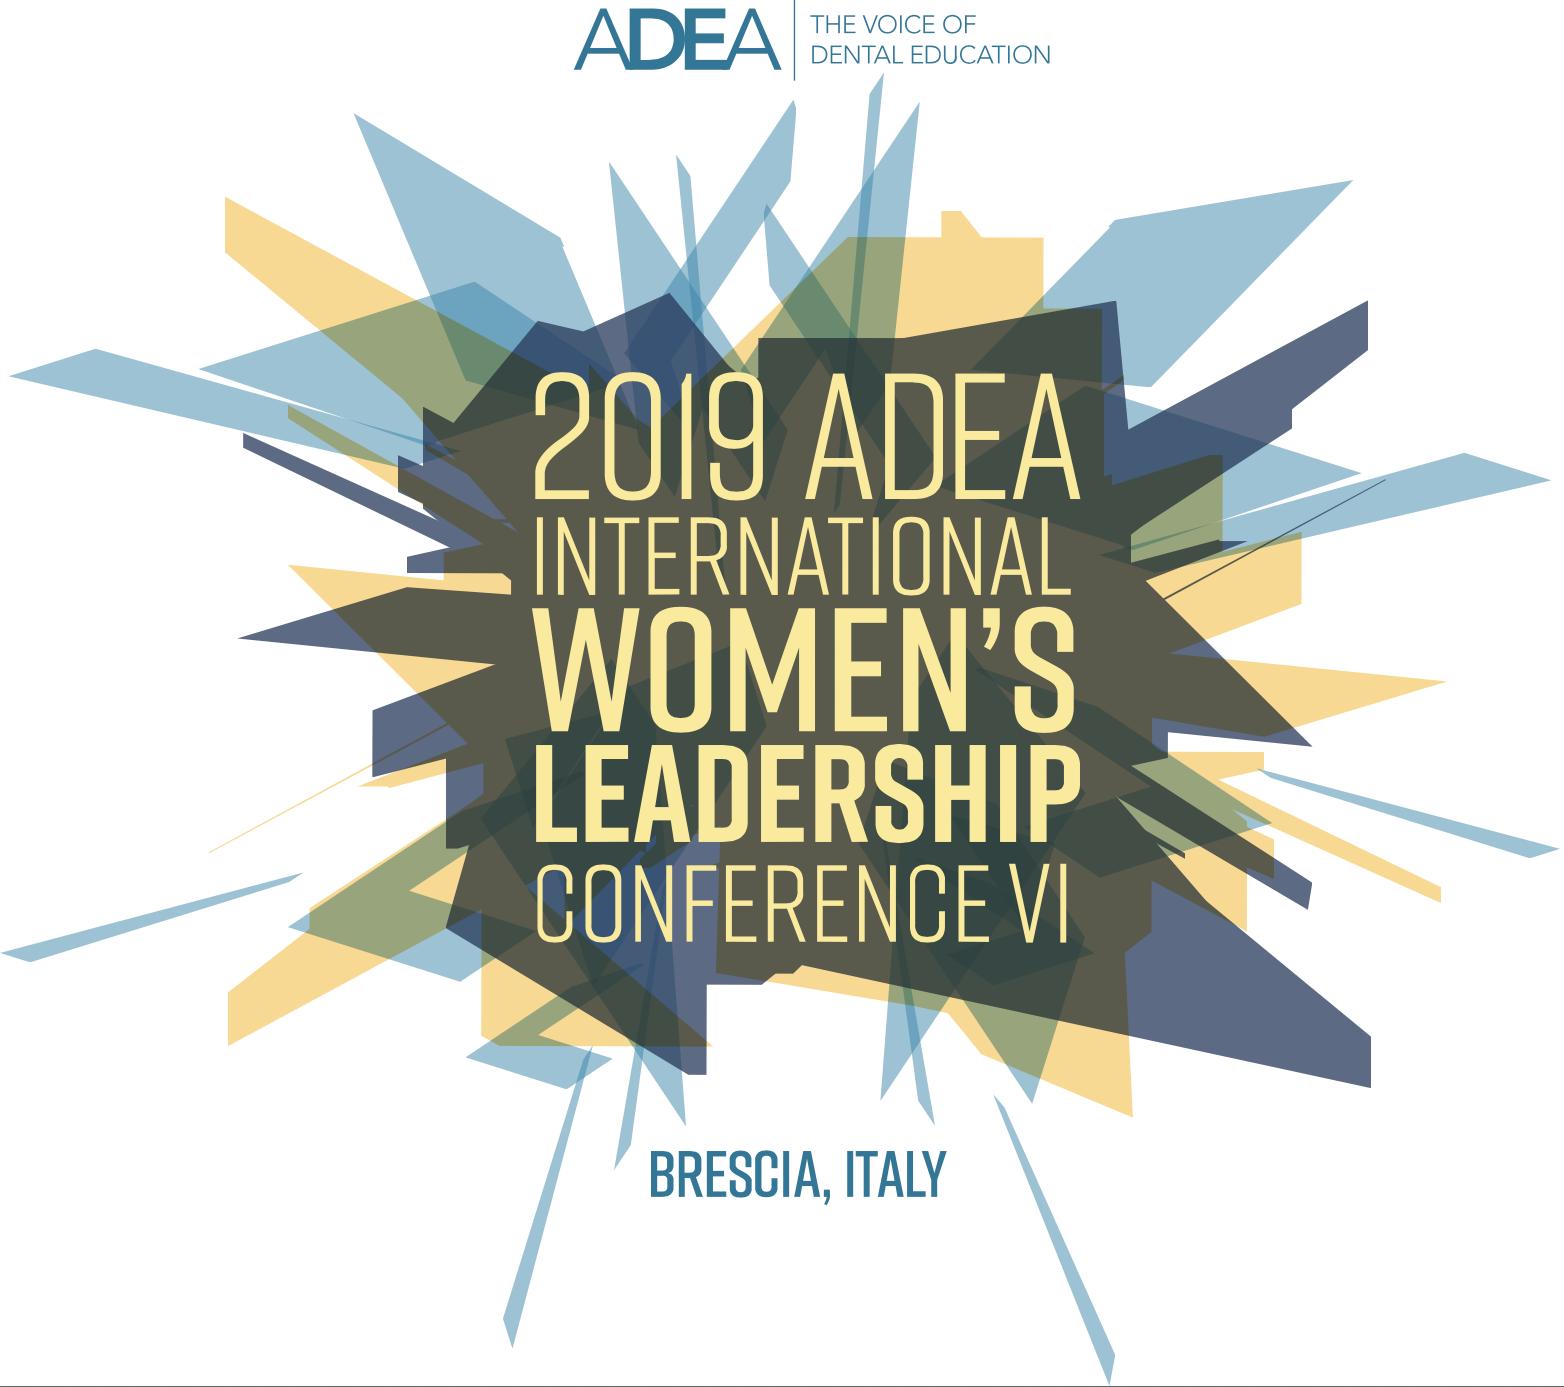 International Woman's Leadership Conference VI